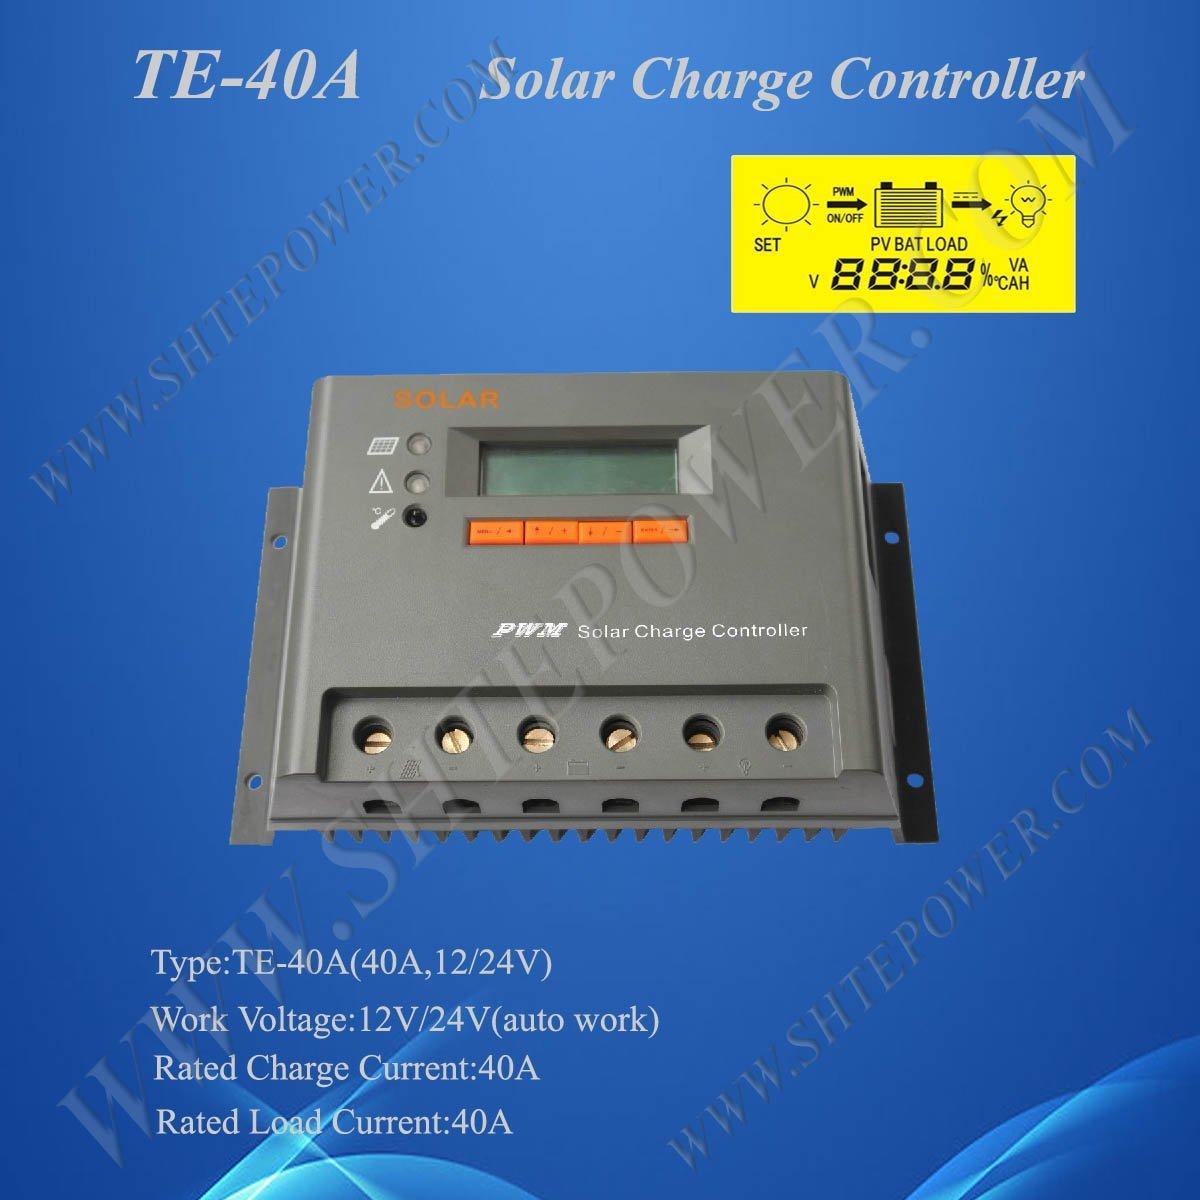 Регулятор солнечного заряда 12 V/24 V автоматическая работа 40A, CE& ROHS одобрено